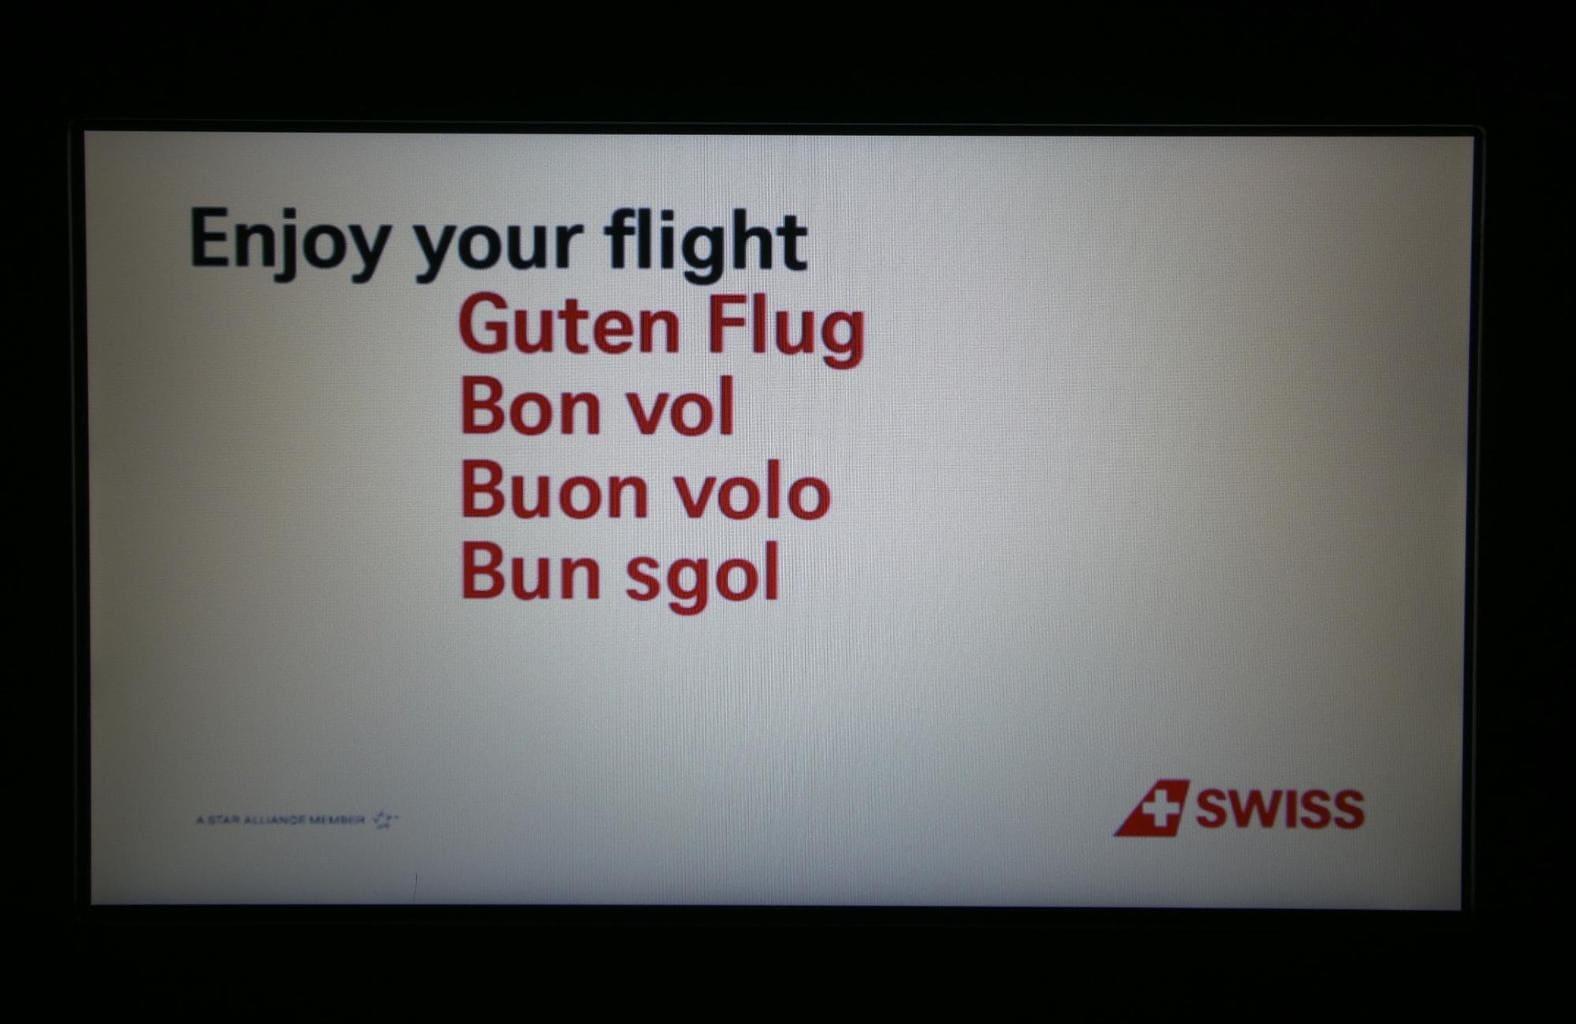 Multi language announcement on Swiss